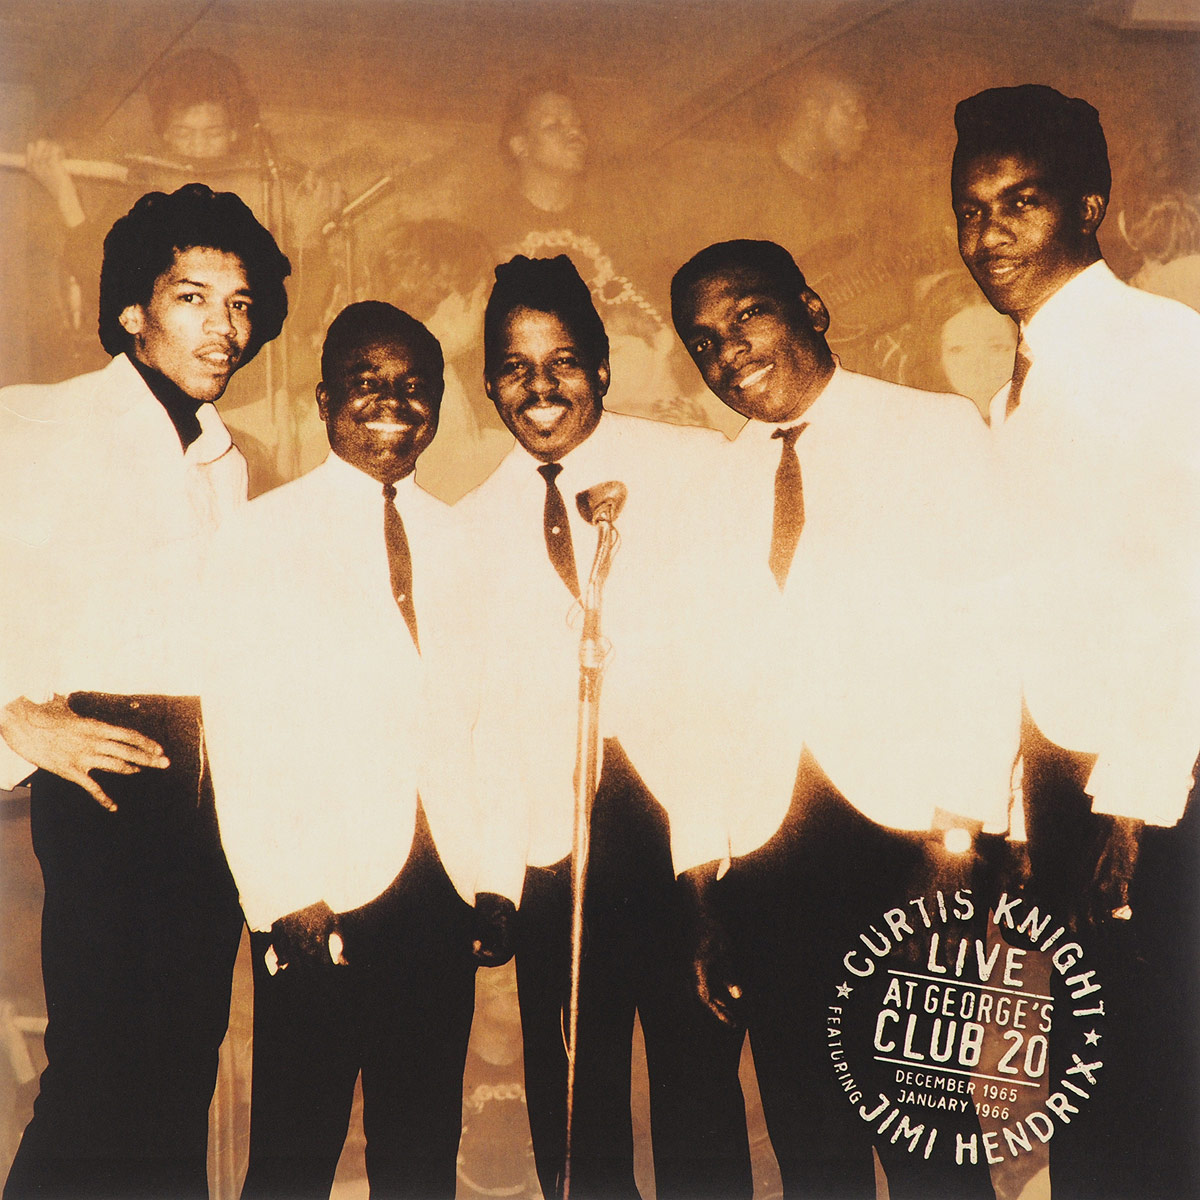 Кертис Найт,Джими Хендрикс Curtis Knight, Jimi Hendrix. Live At George's Club 20 (2 LP) виниловая пластинка the jimi hendrix experience electric ladyland